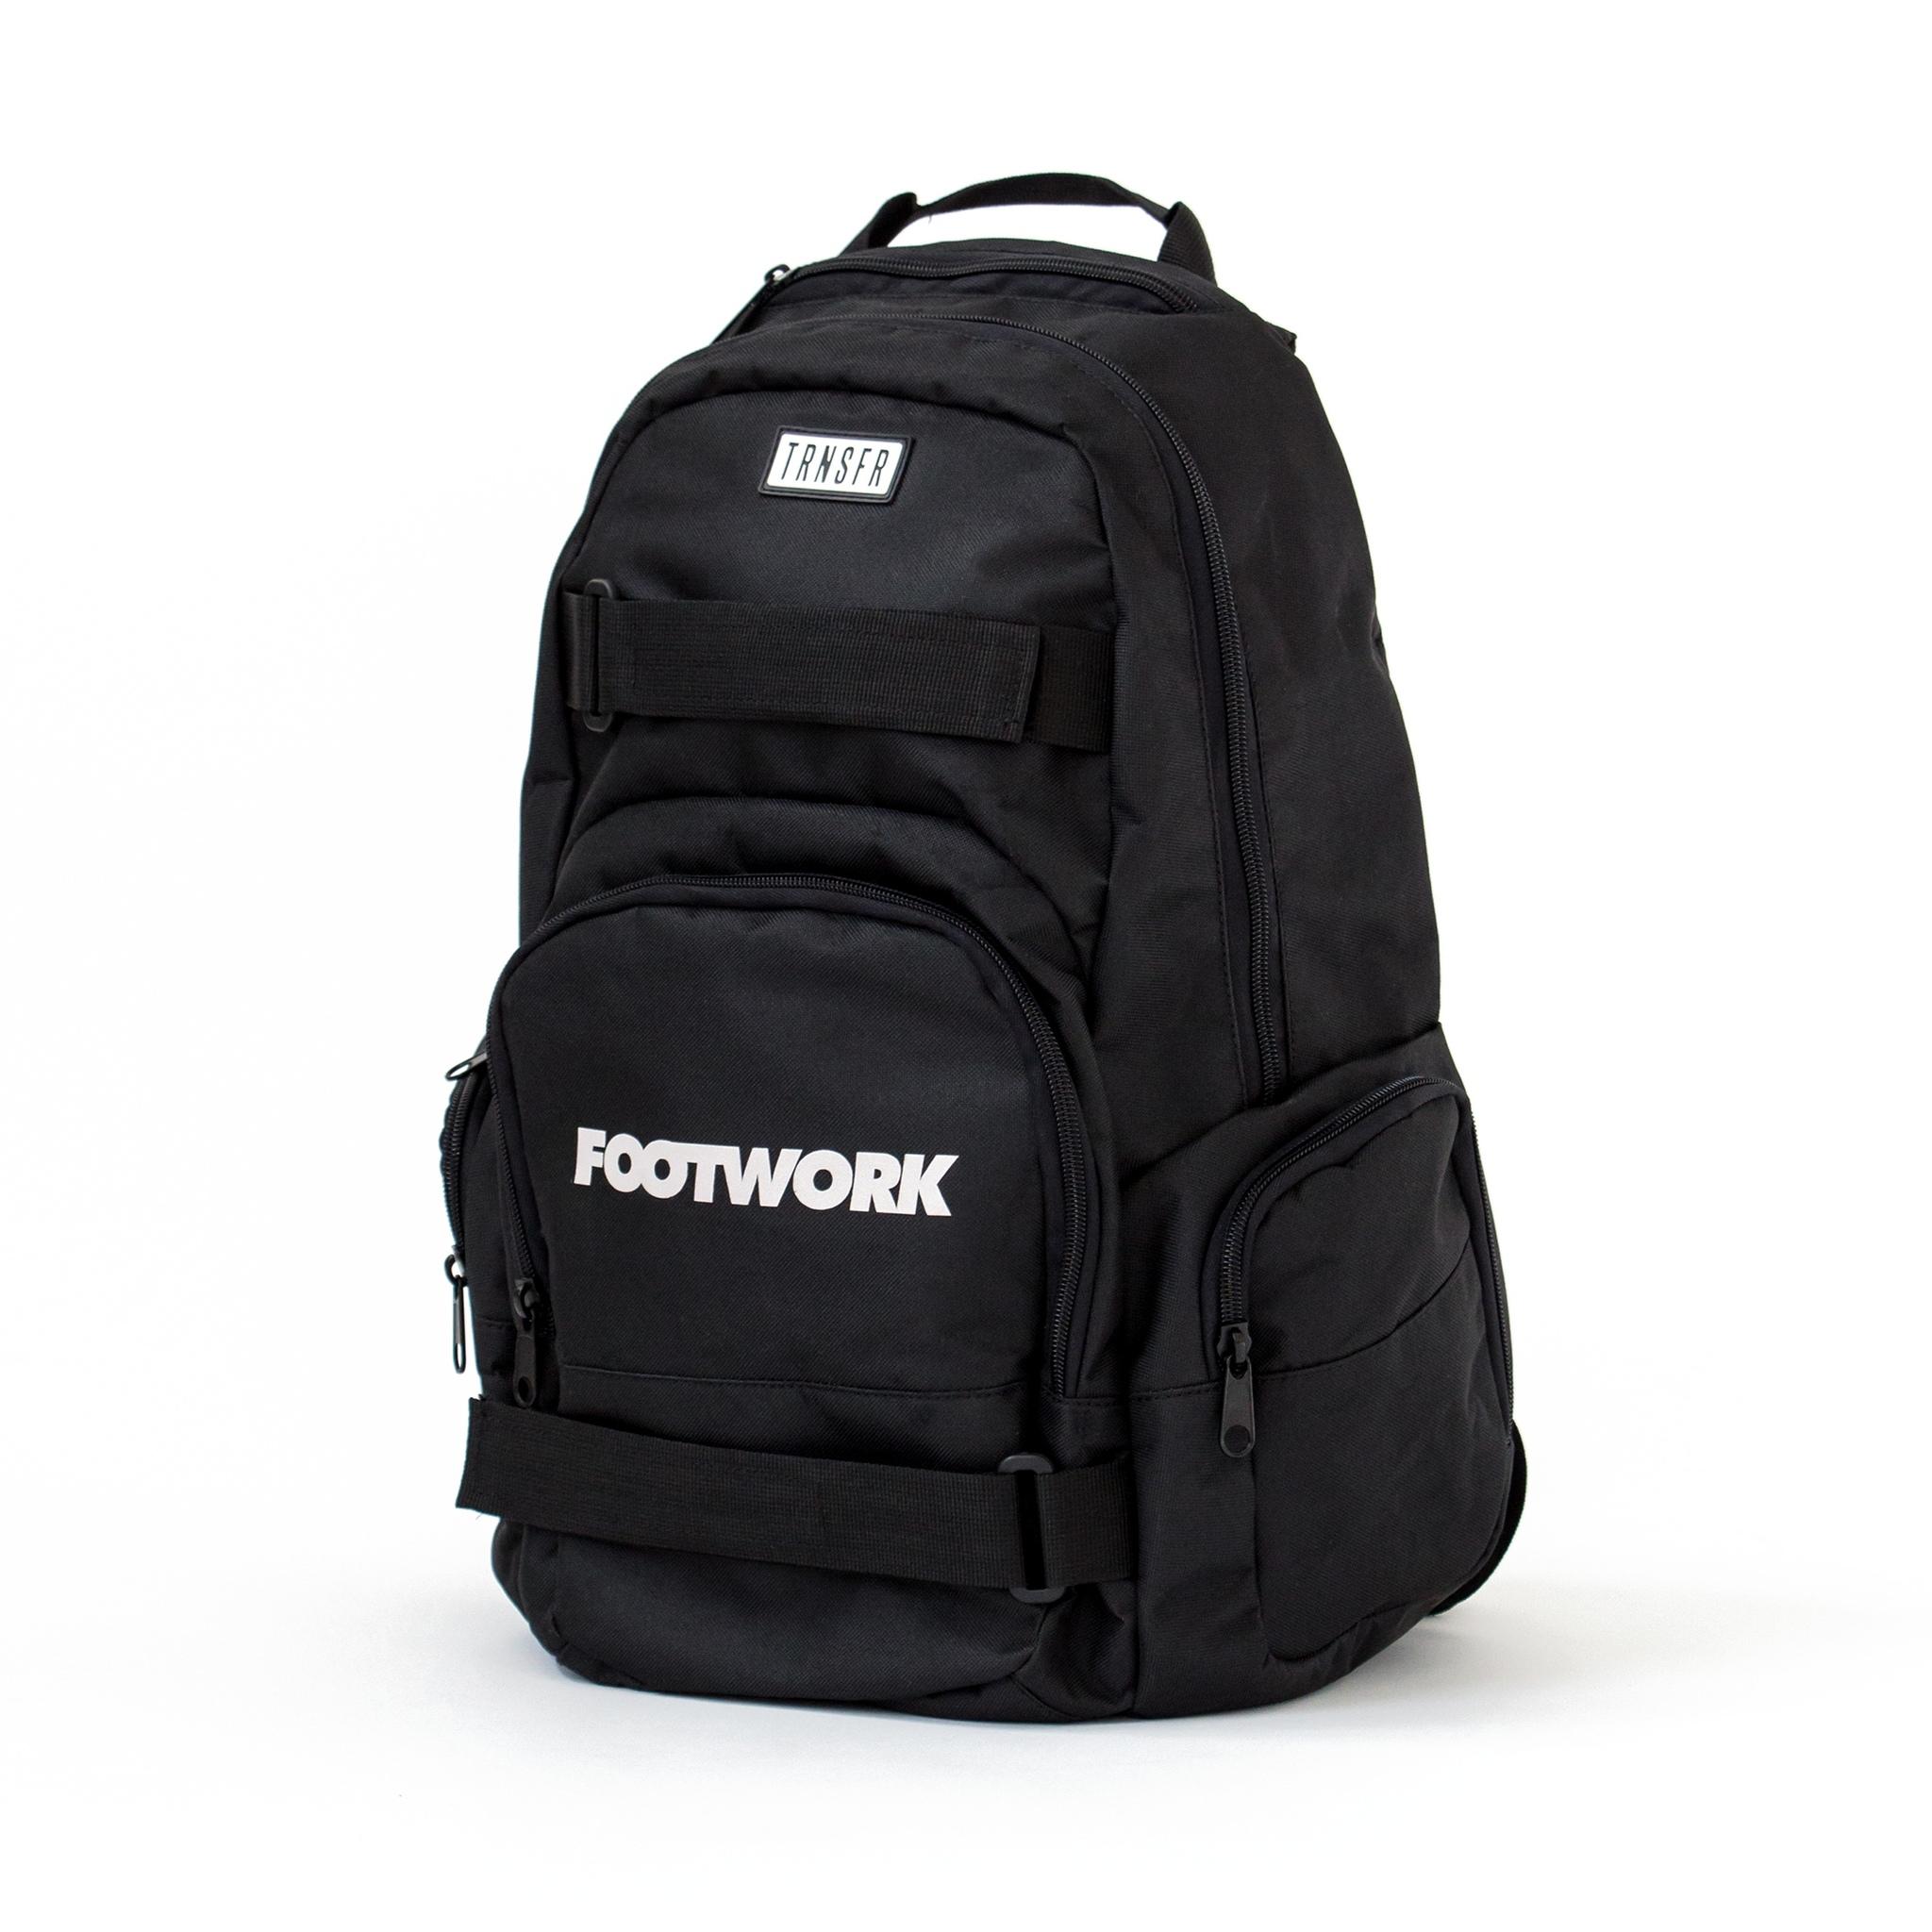 Рюкзак для скейта FOOTWORK x TRANSFER (Black)